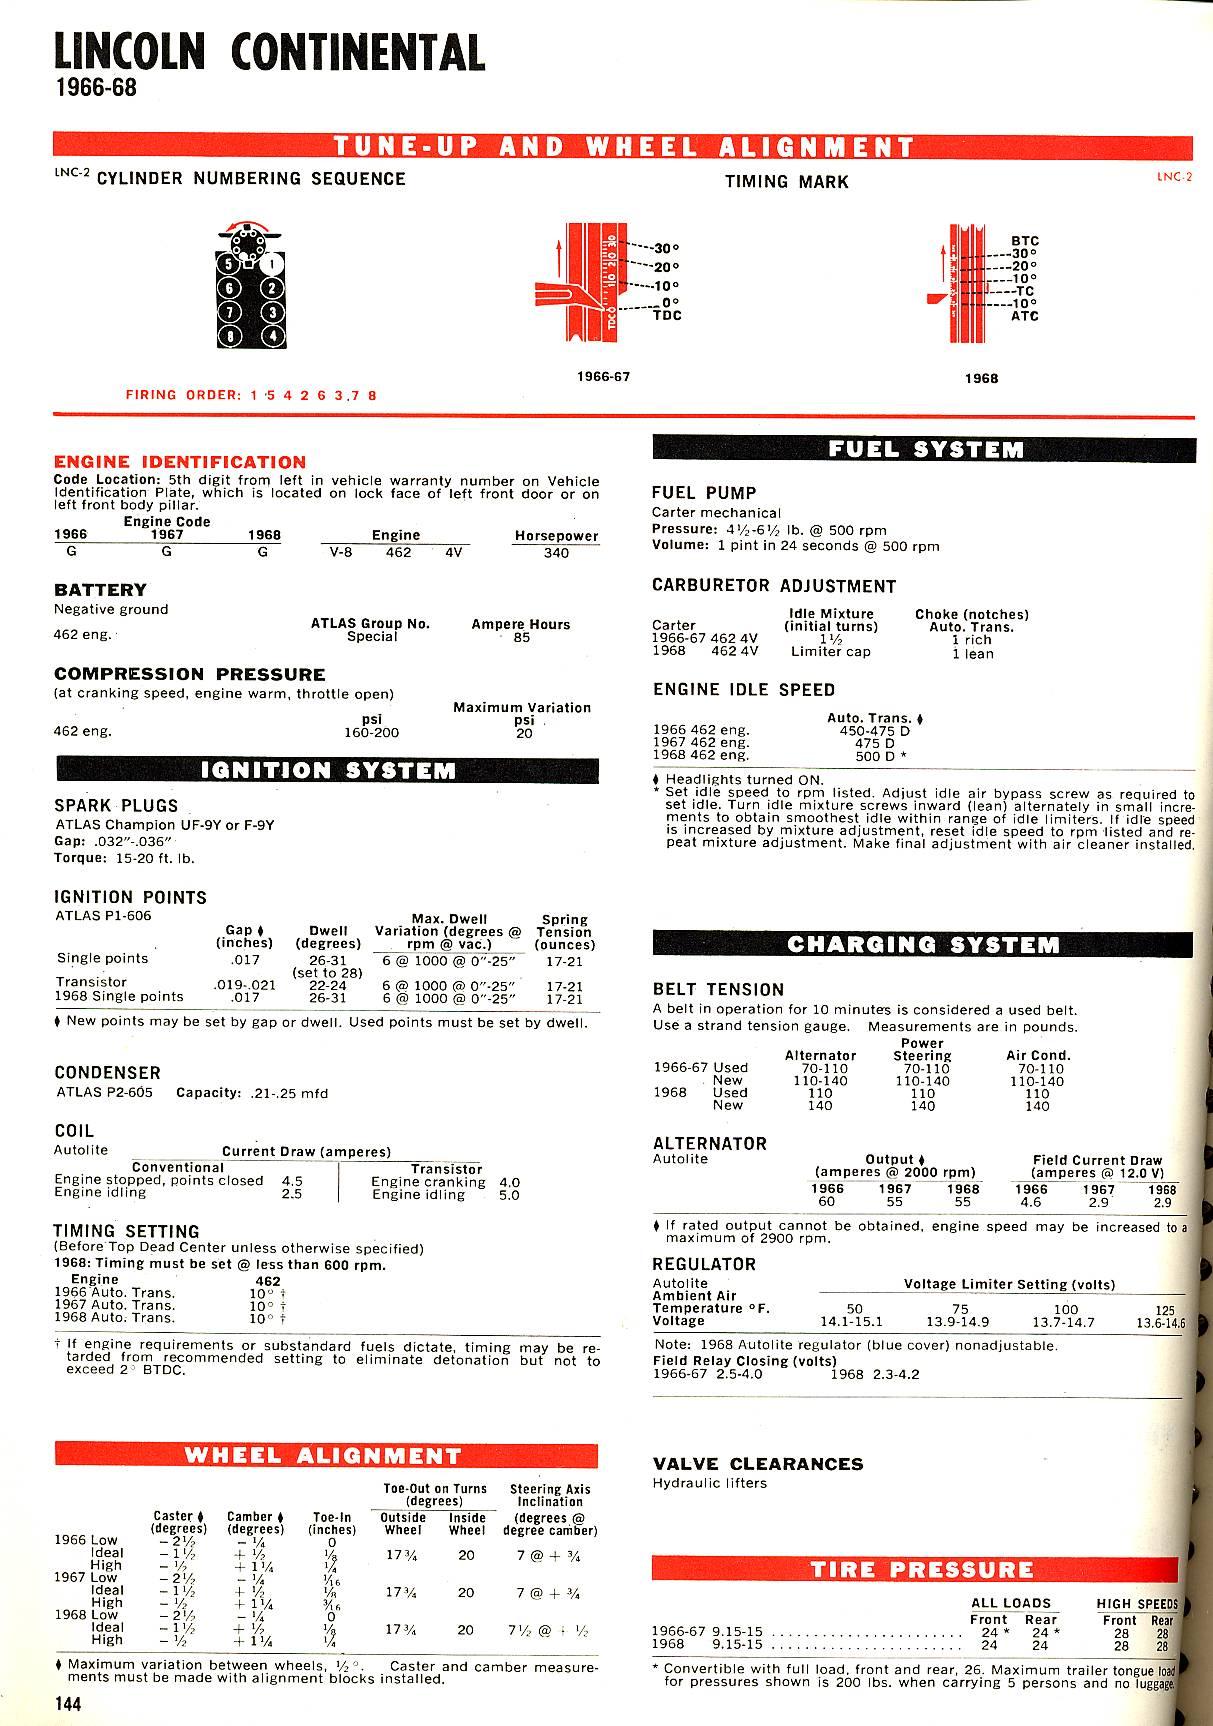 28 1965 lincoln continental service manual pdf 38321 lincoln continental specs 1961 1962. Black Bedroom Furniture Sets. Home Design Ideas